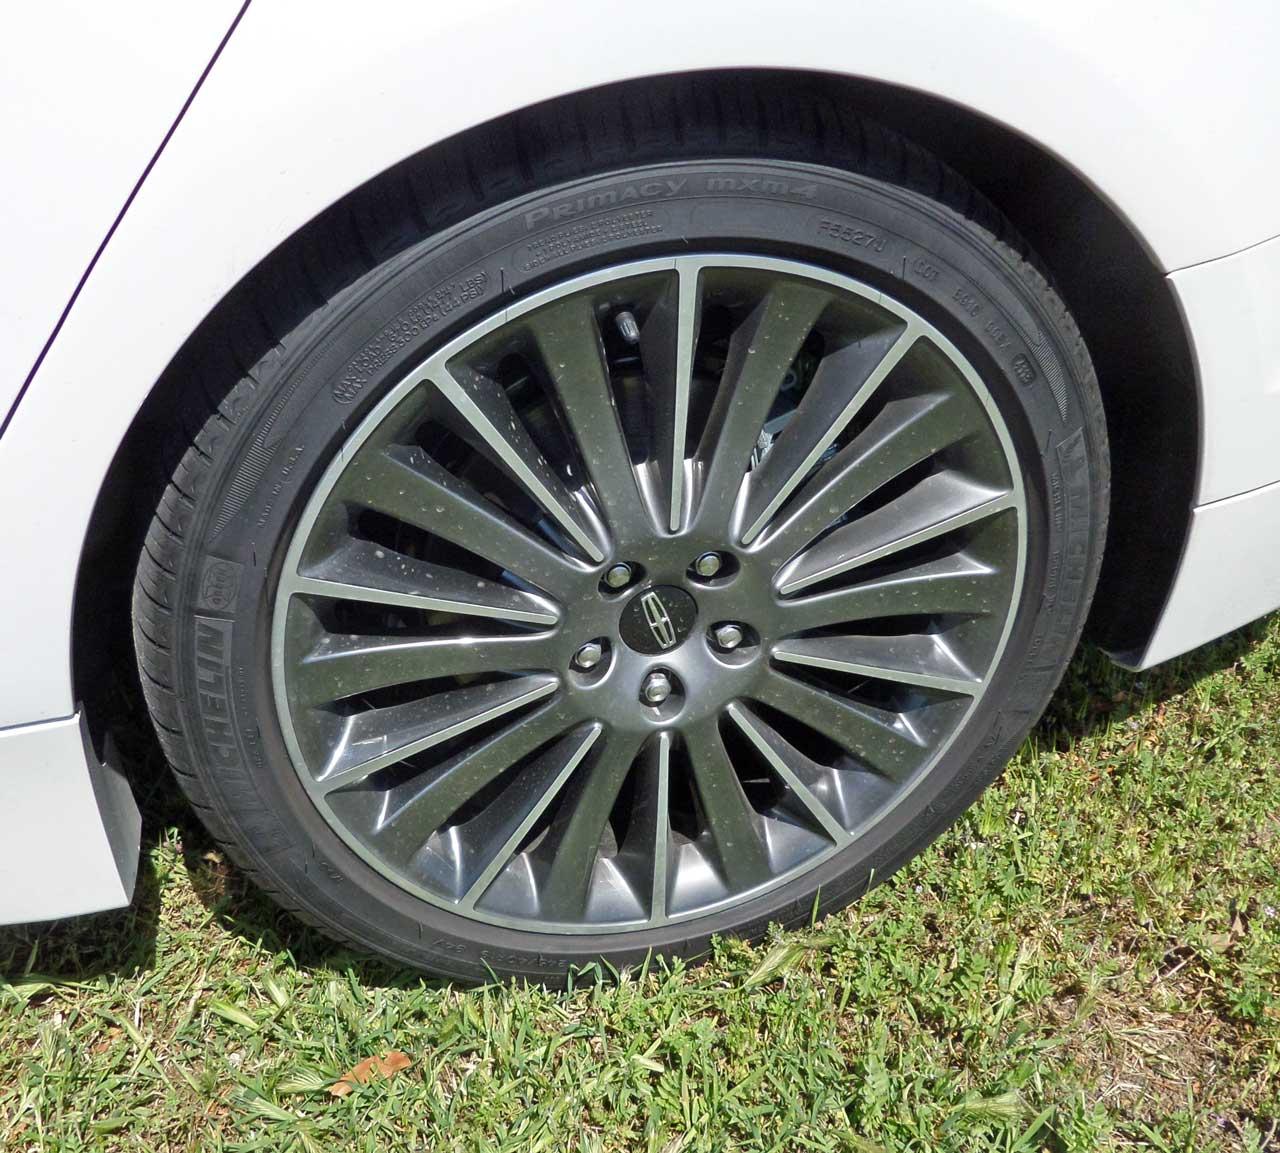 2015 Lincoln Mkz Suspension: 2014 Lincoln MKZ Hybrid Test Drive